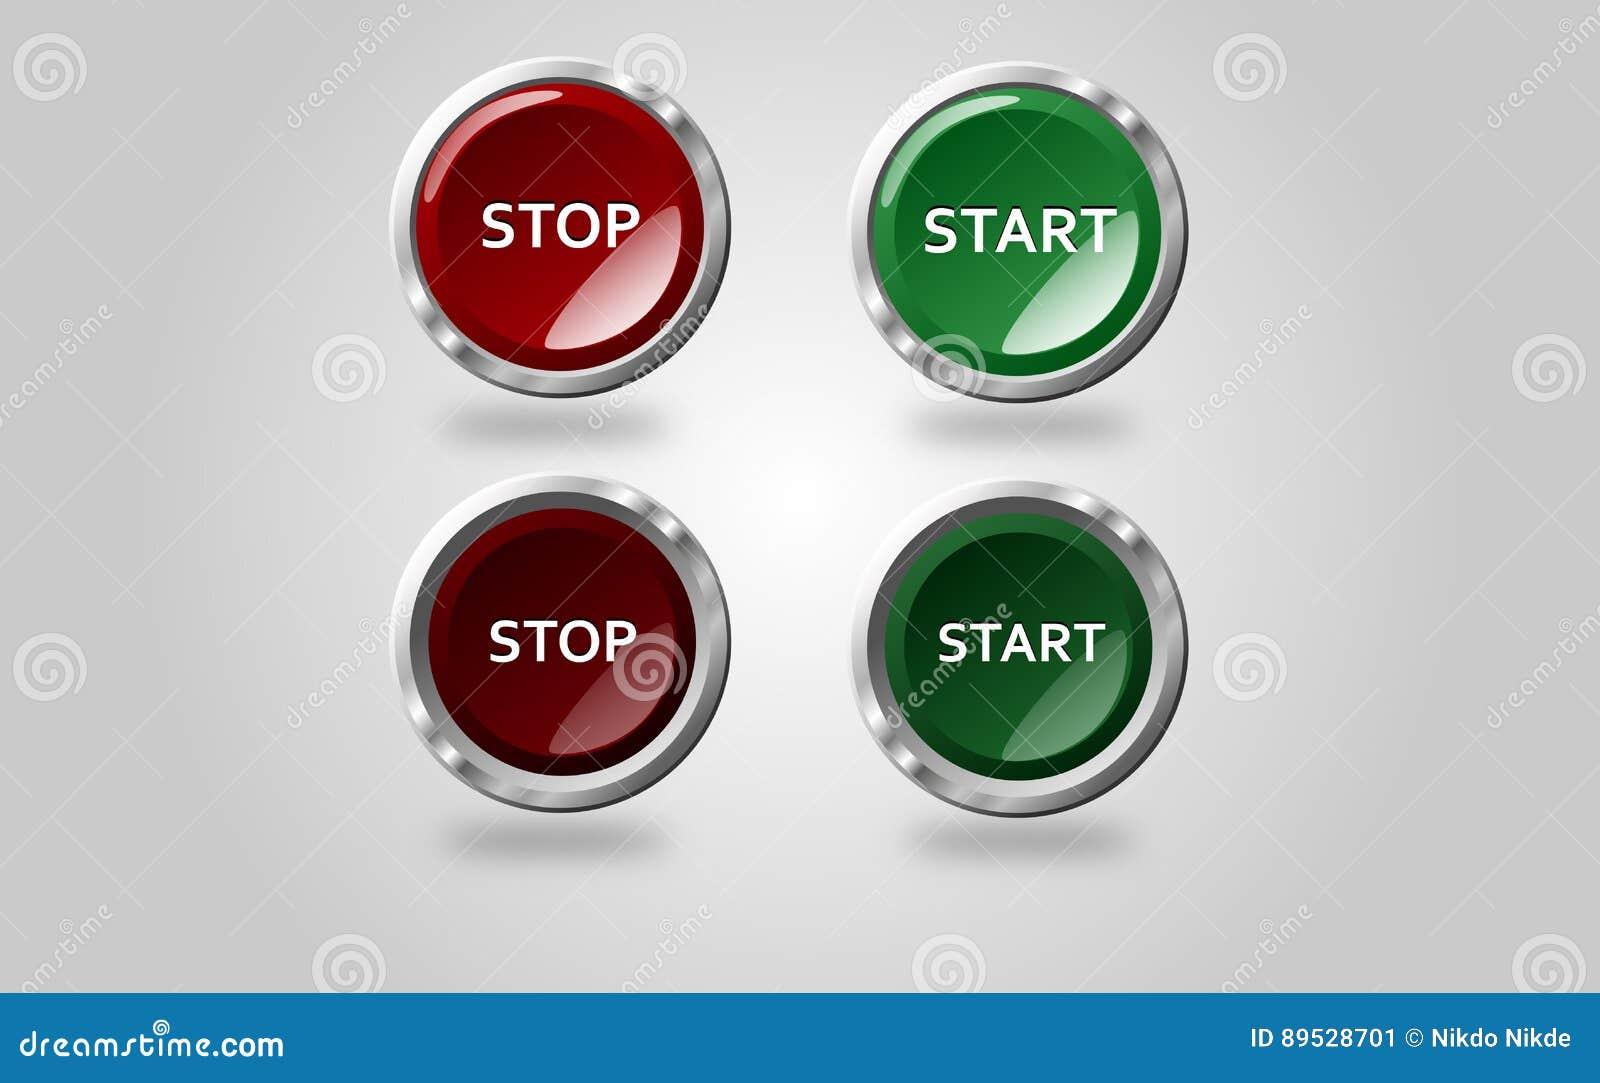 button stop start stock image 89528701. Black Bedroom Furniture Sets. Home Design Ideas